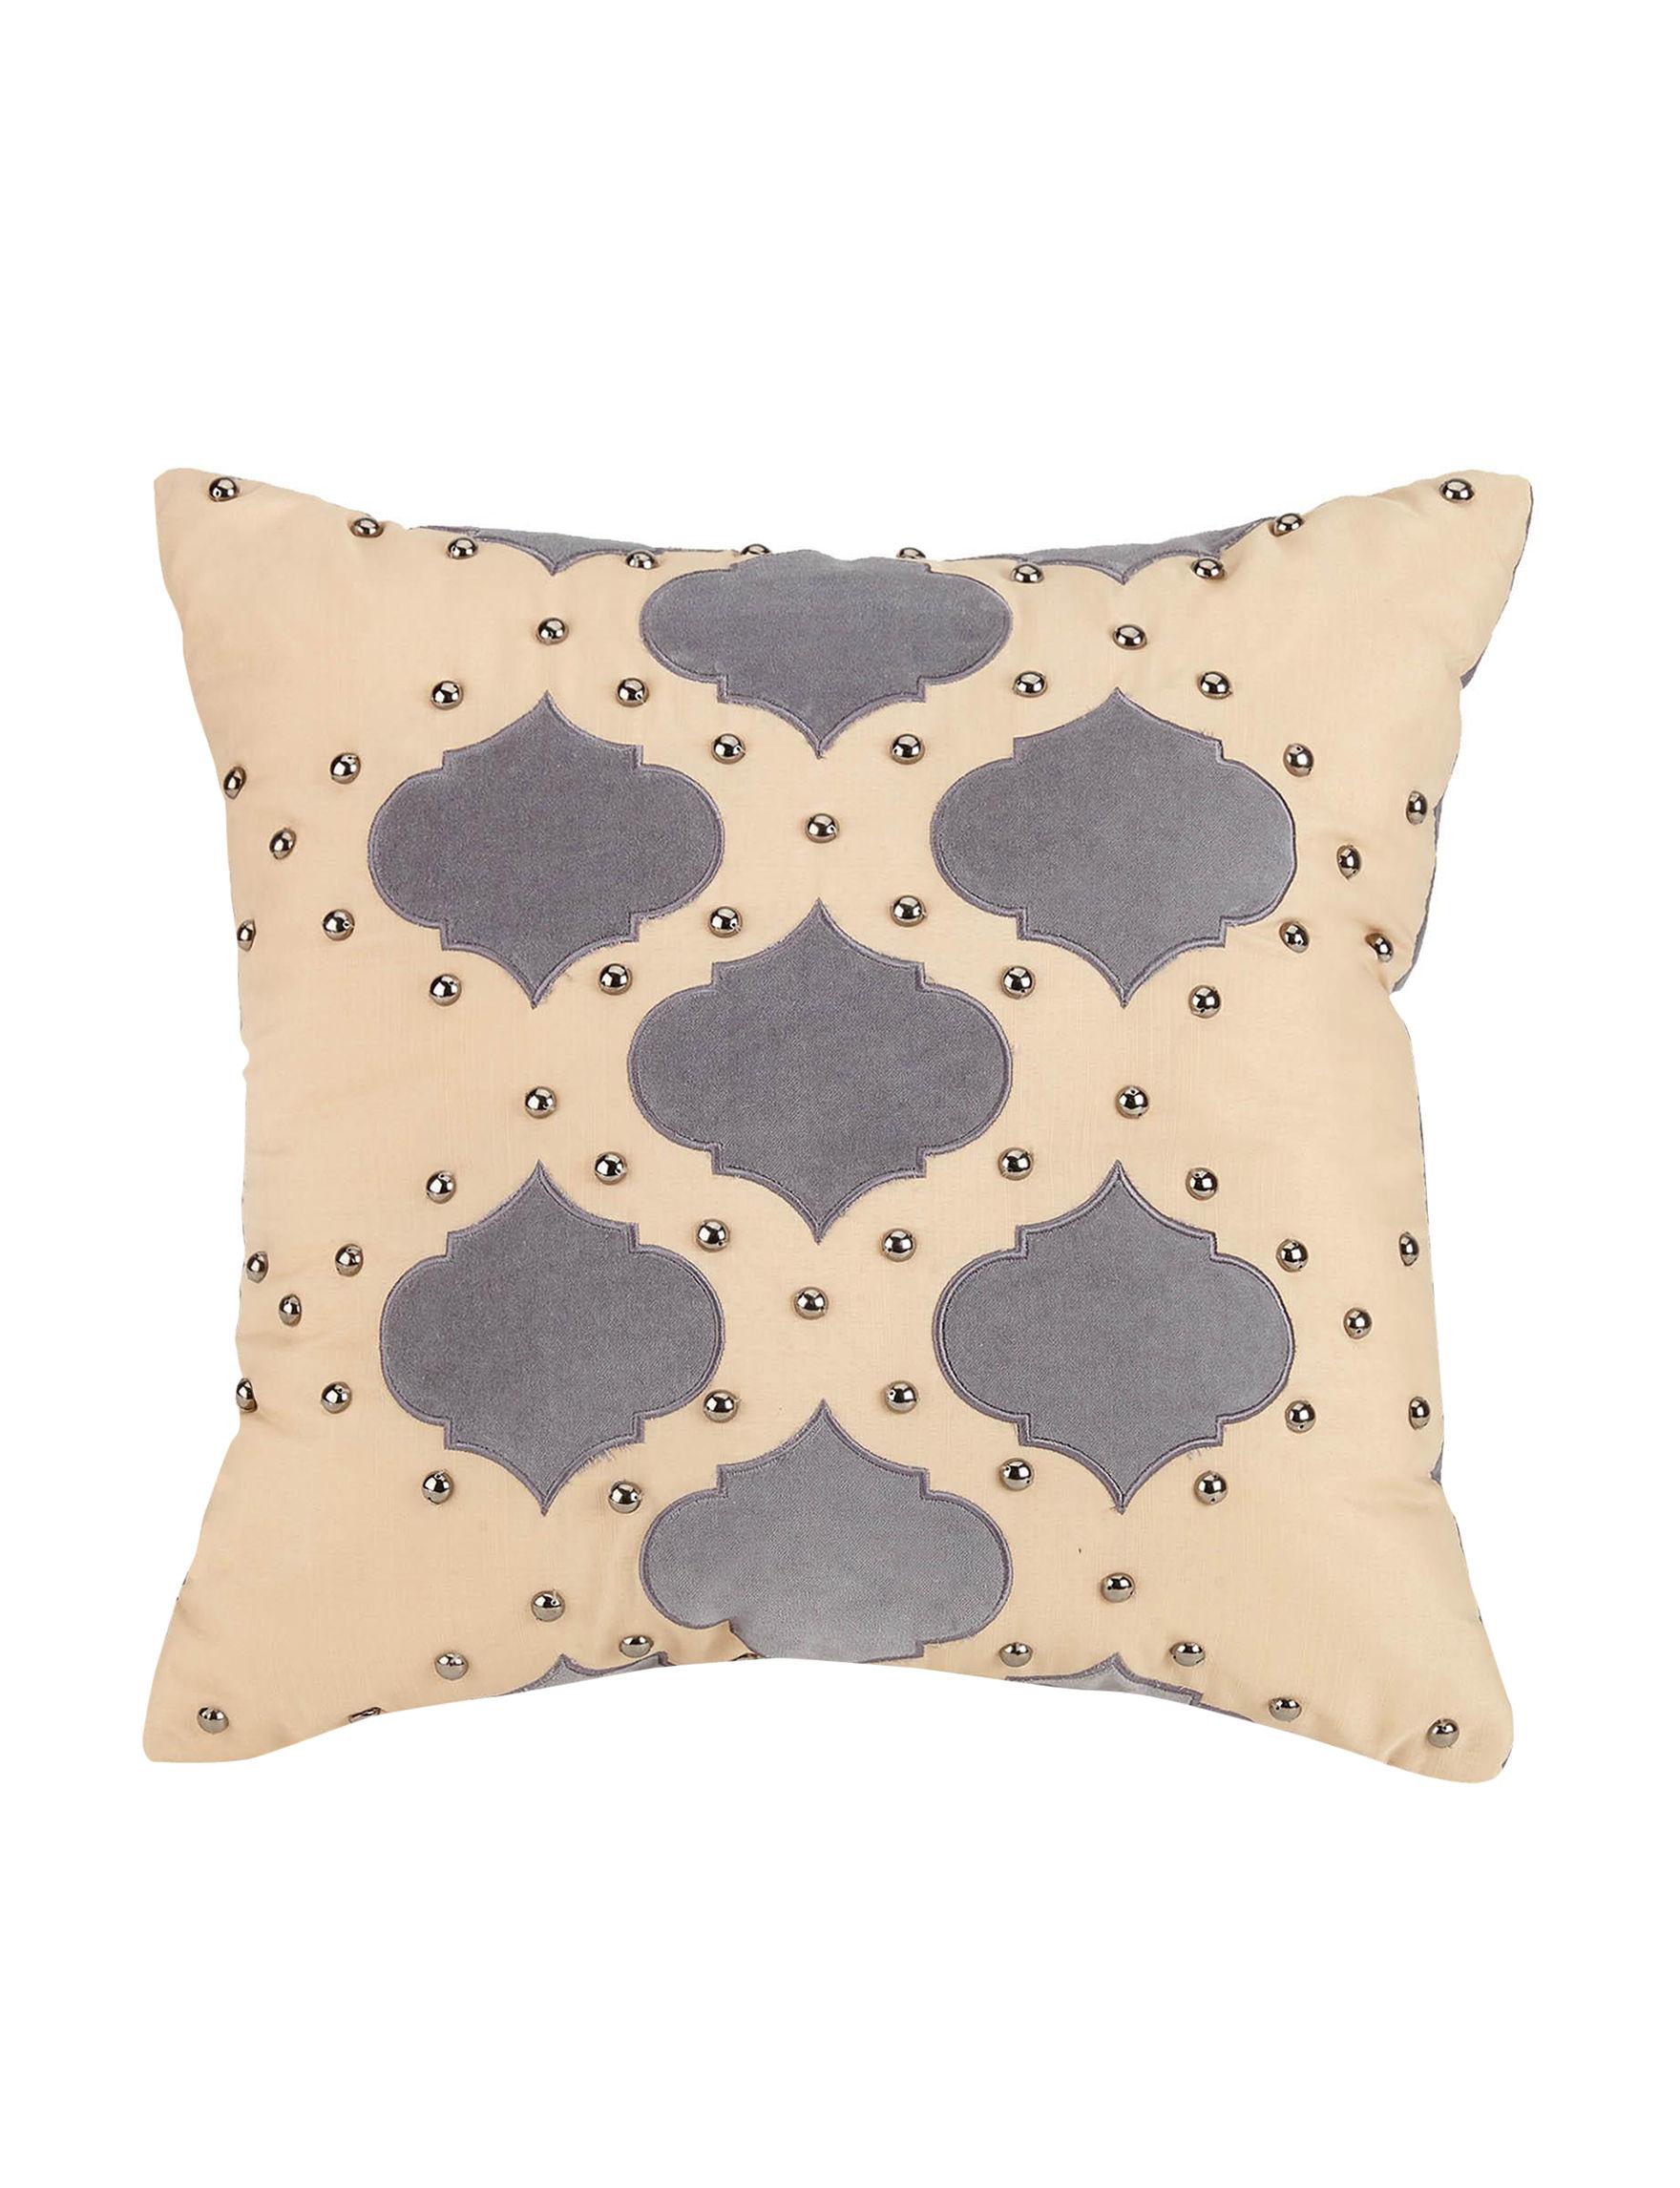 Jessica Simpson Coral / Grey Decorative Pillows